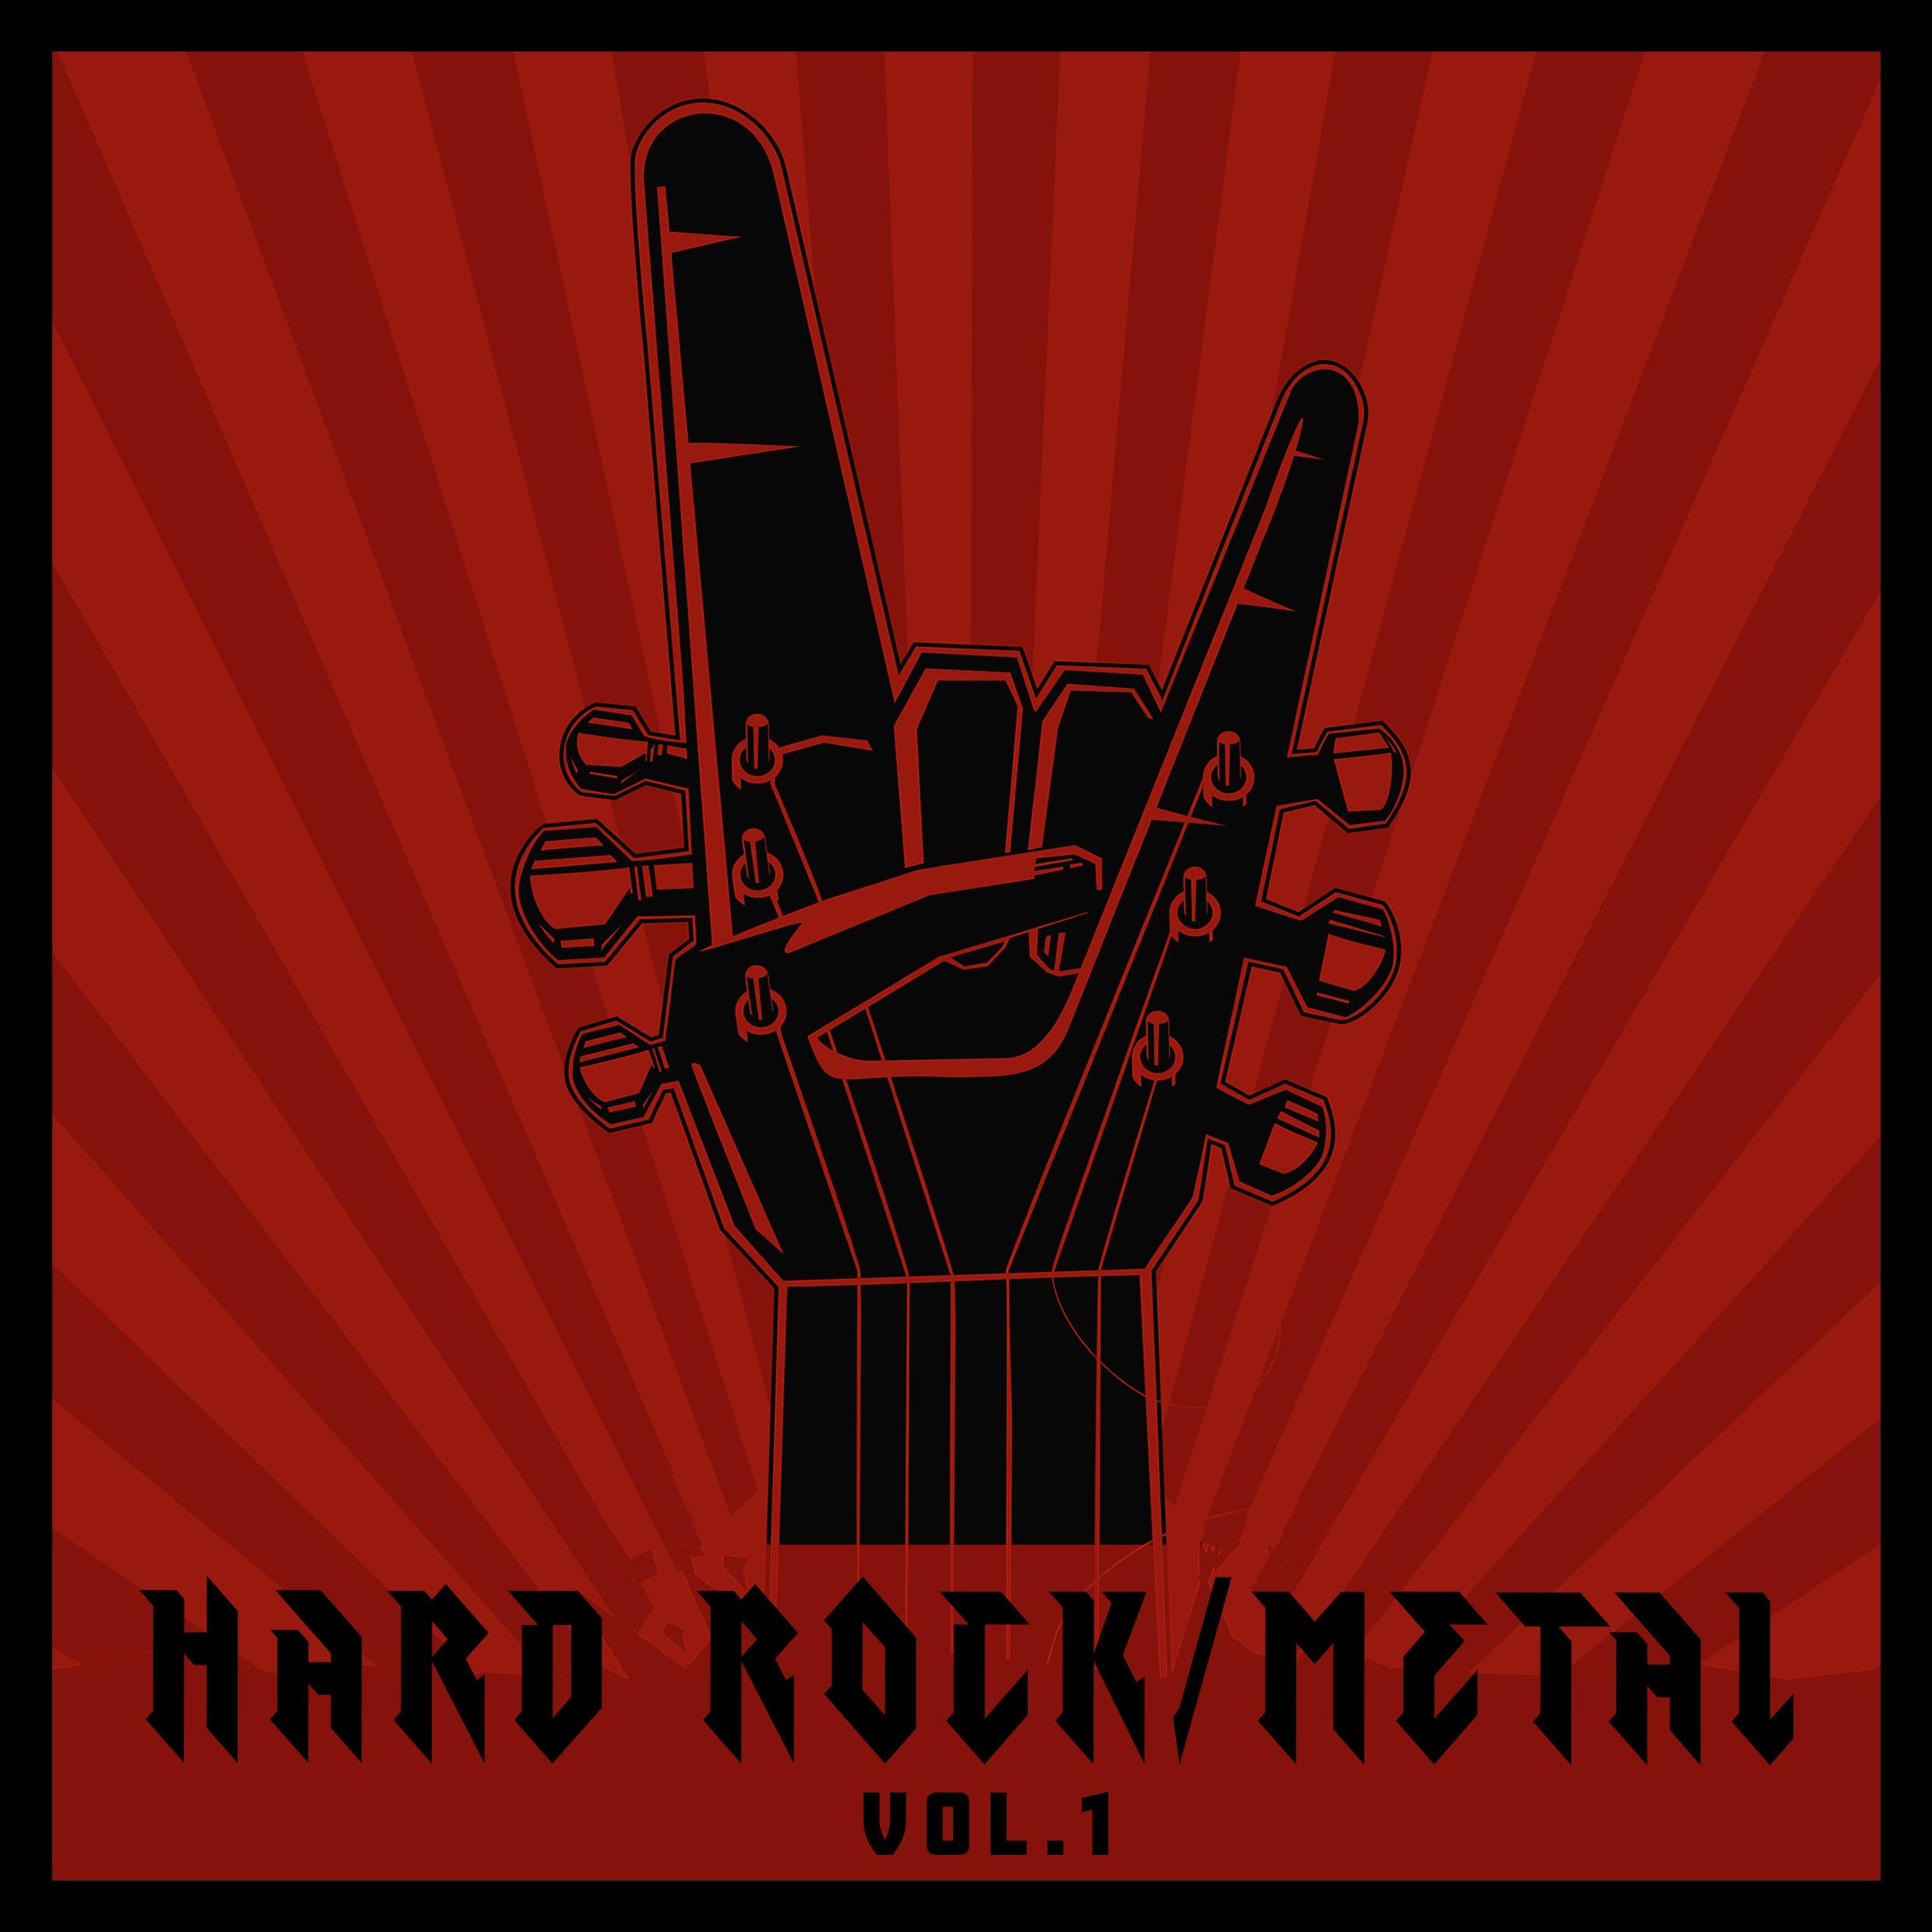 HardRockandMetal_Vol1.jpg